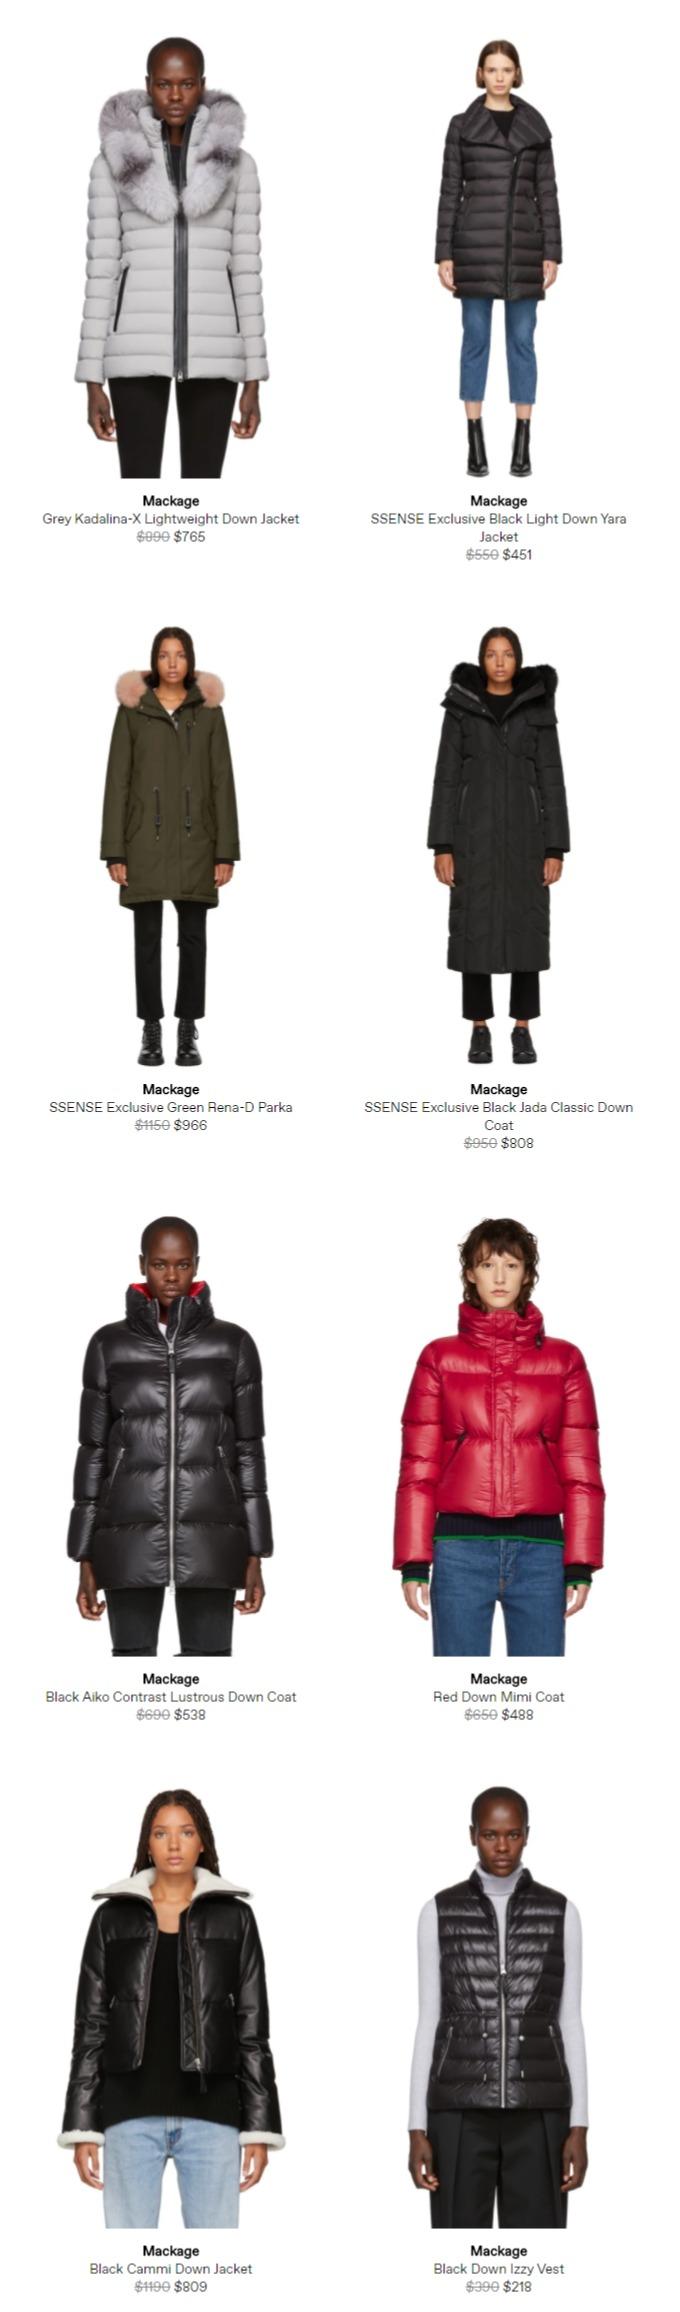 SSENSE精选Mackage 全场男女时尚羽绒服、美包 5.6折起优惠,羽绒服低至 432加元!